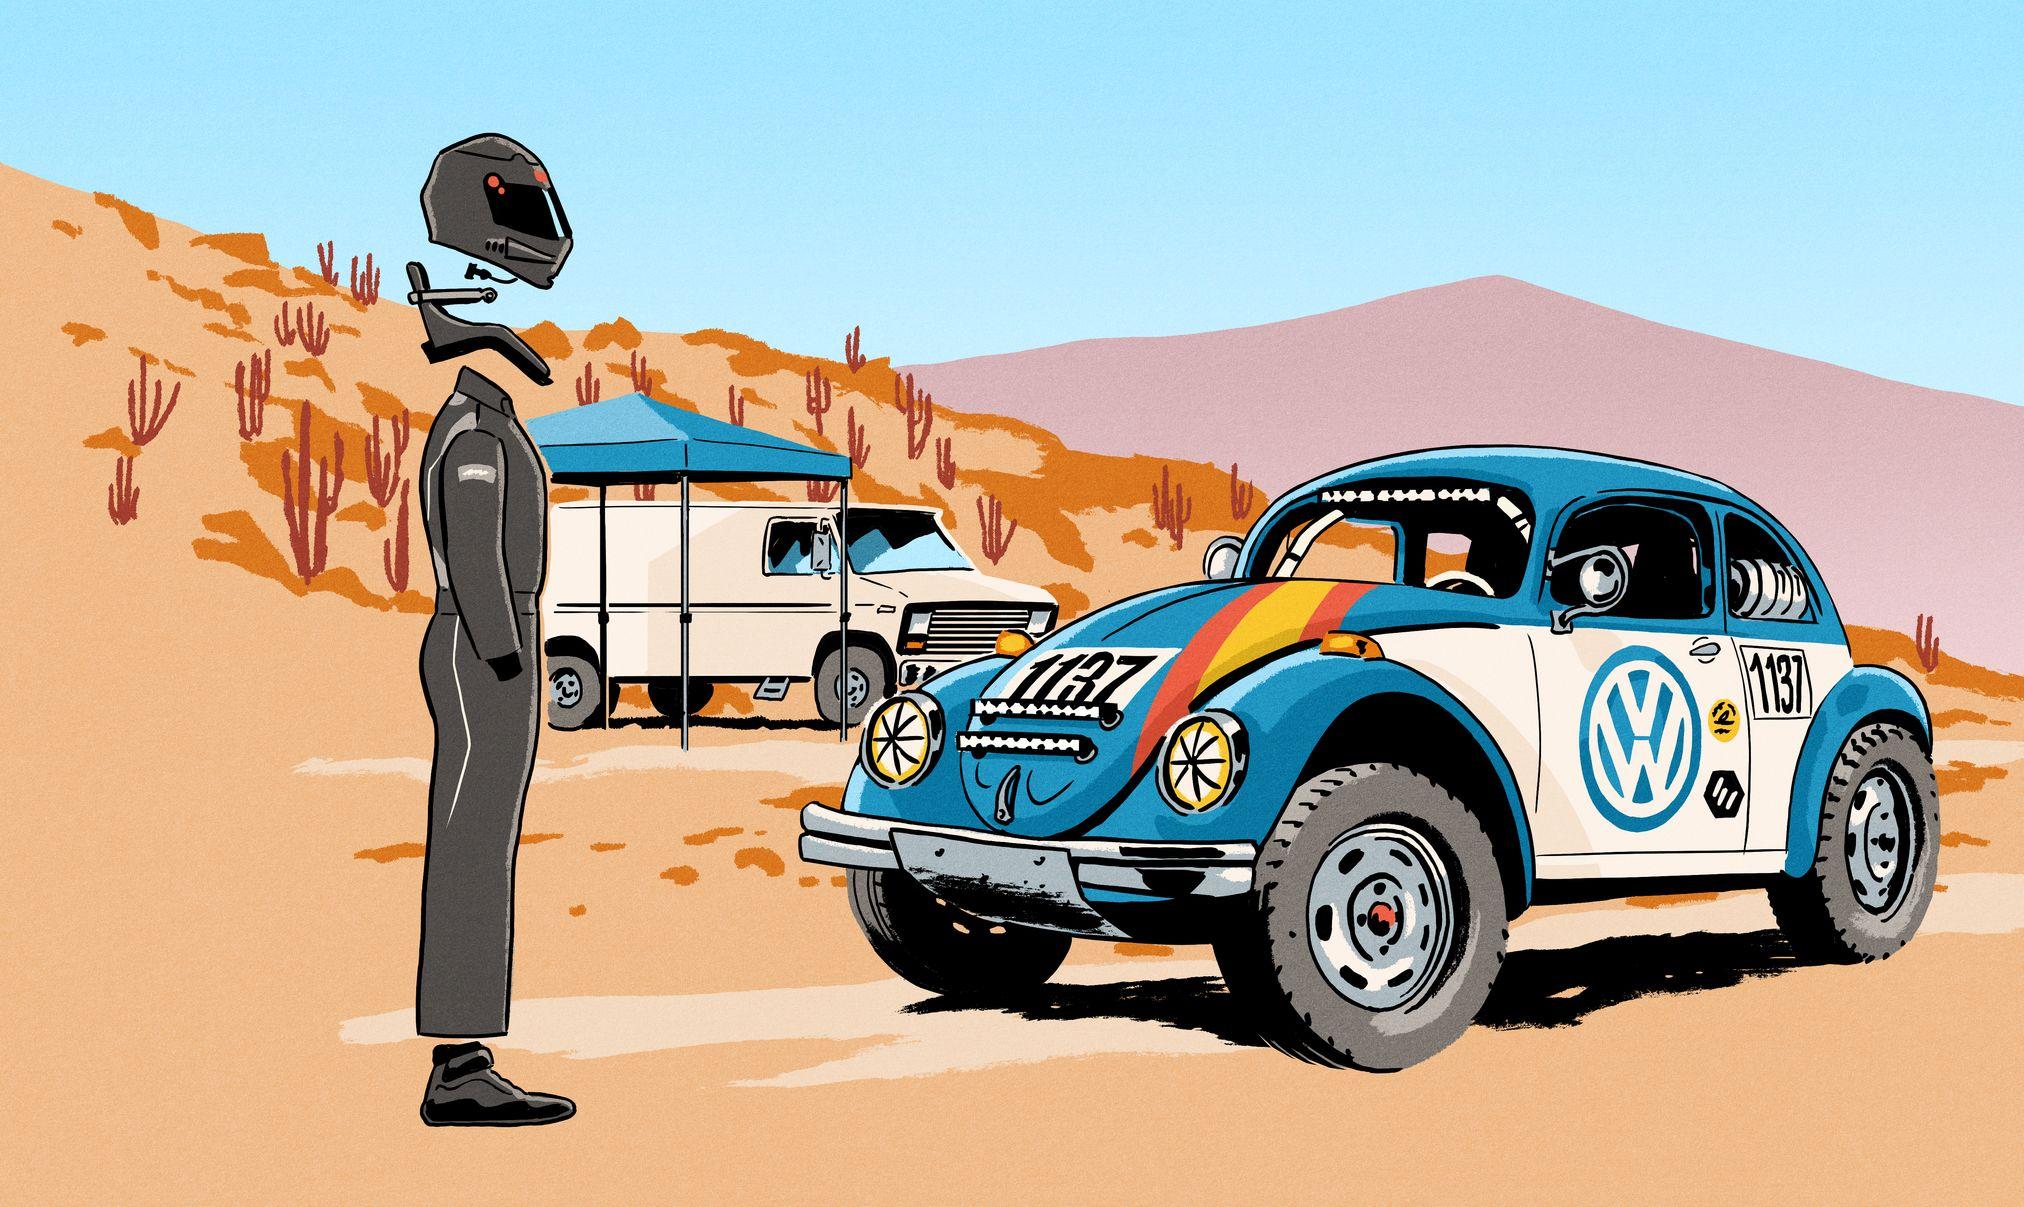 garance-illustration-COST-OF-RACING-BUG-FINAL_web